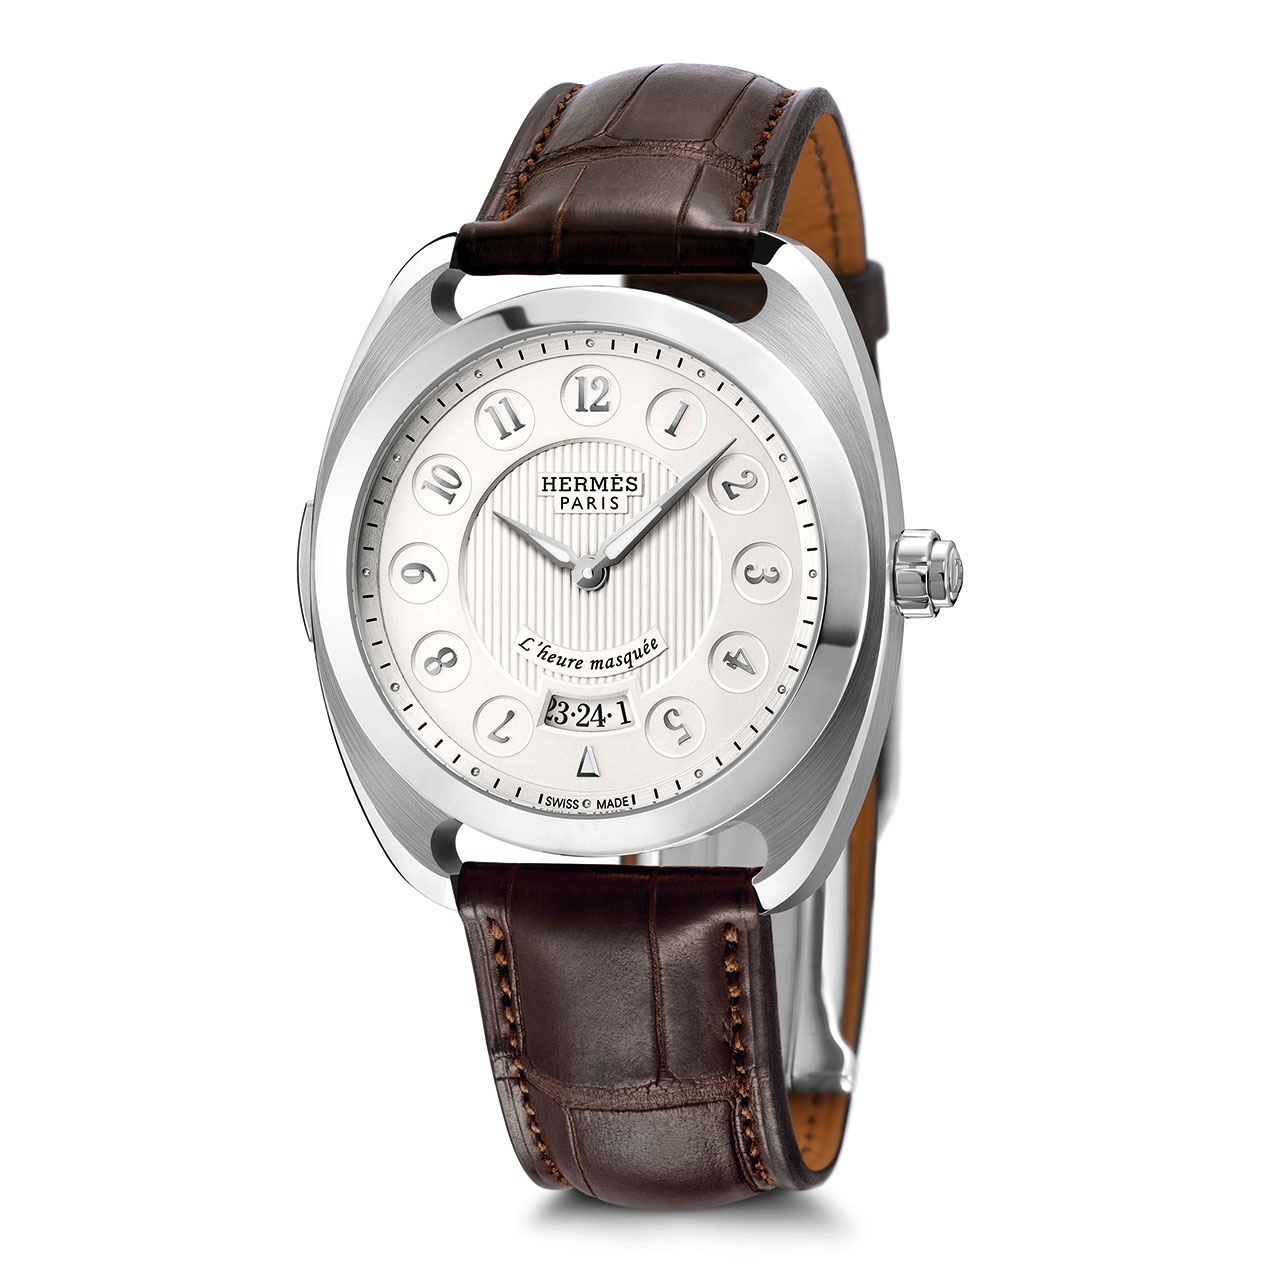 Hermès Dressage L'heure masquée Mechanical Watch